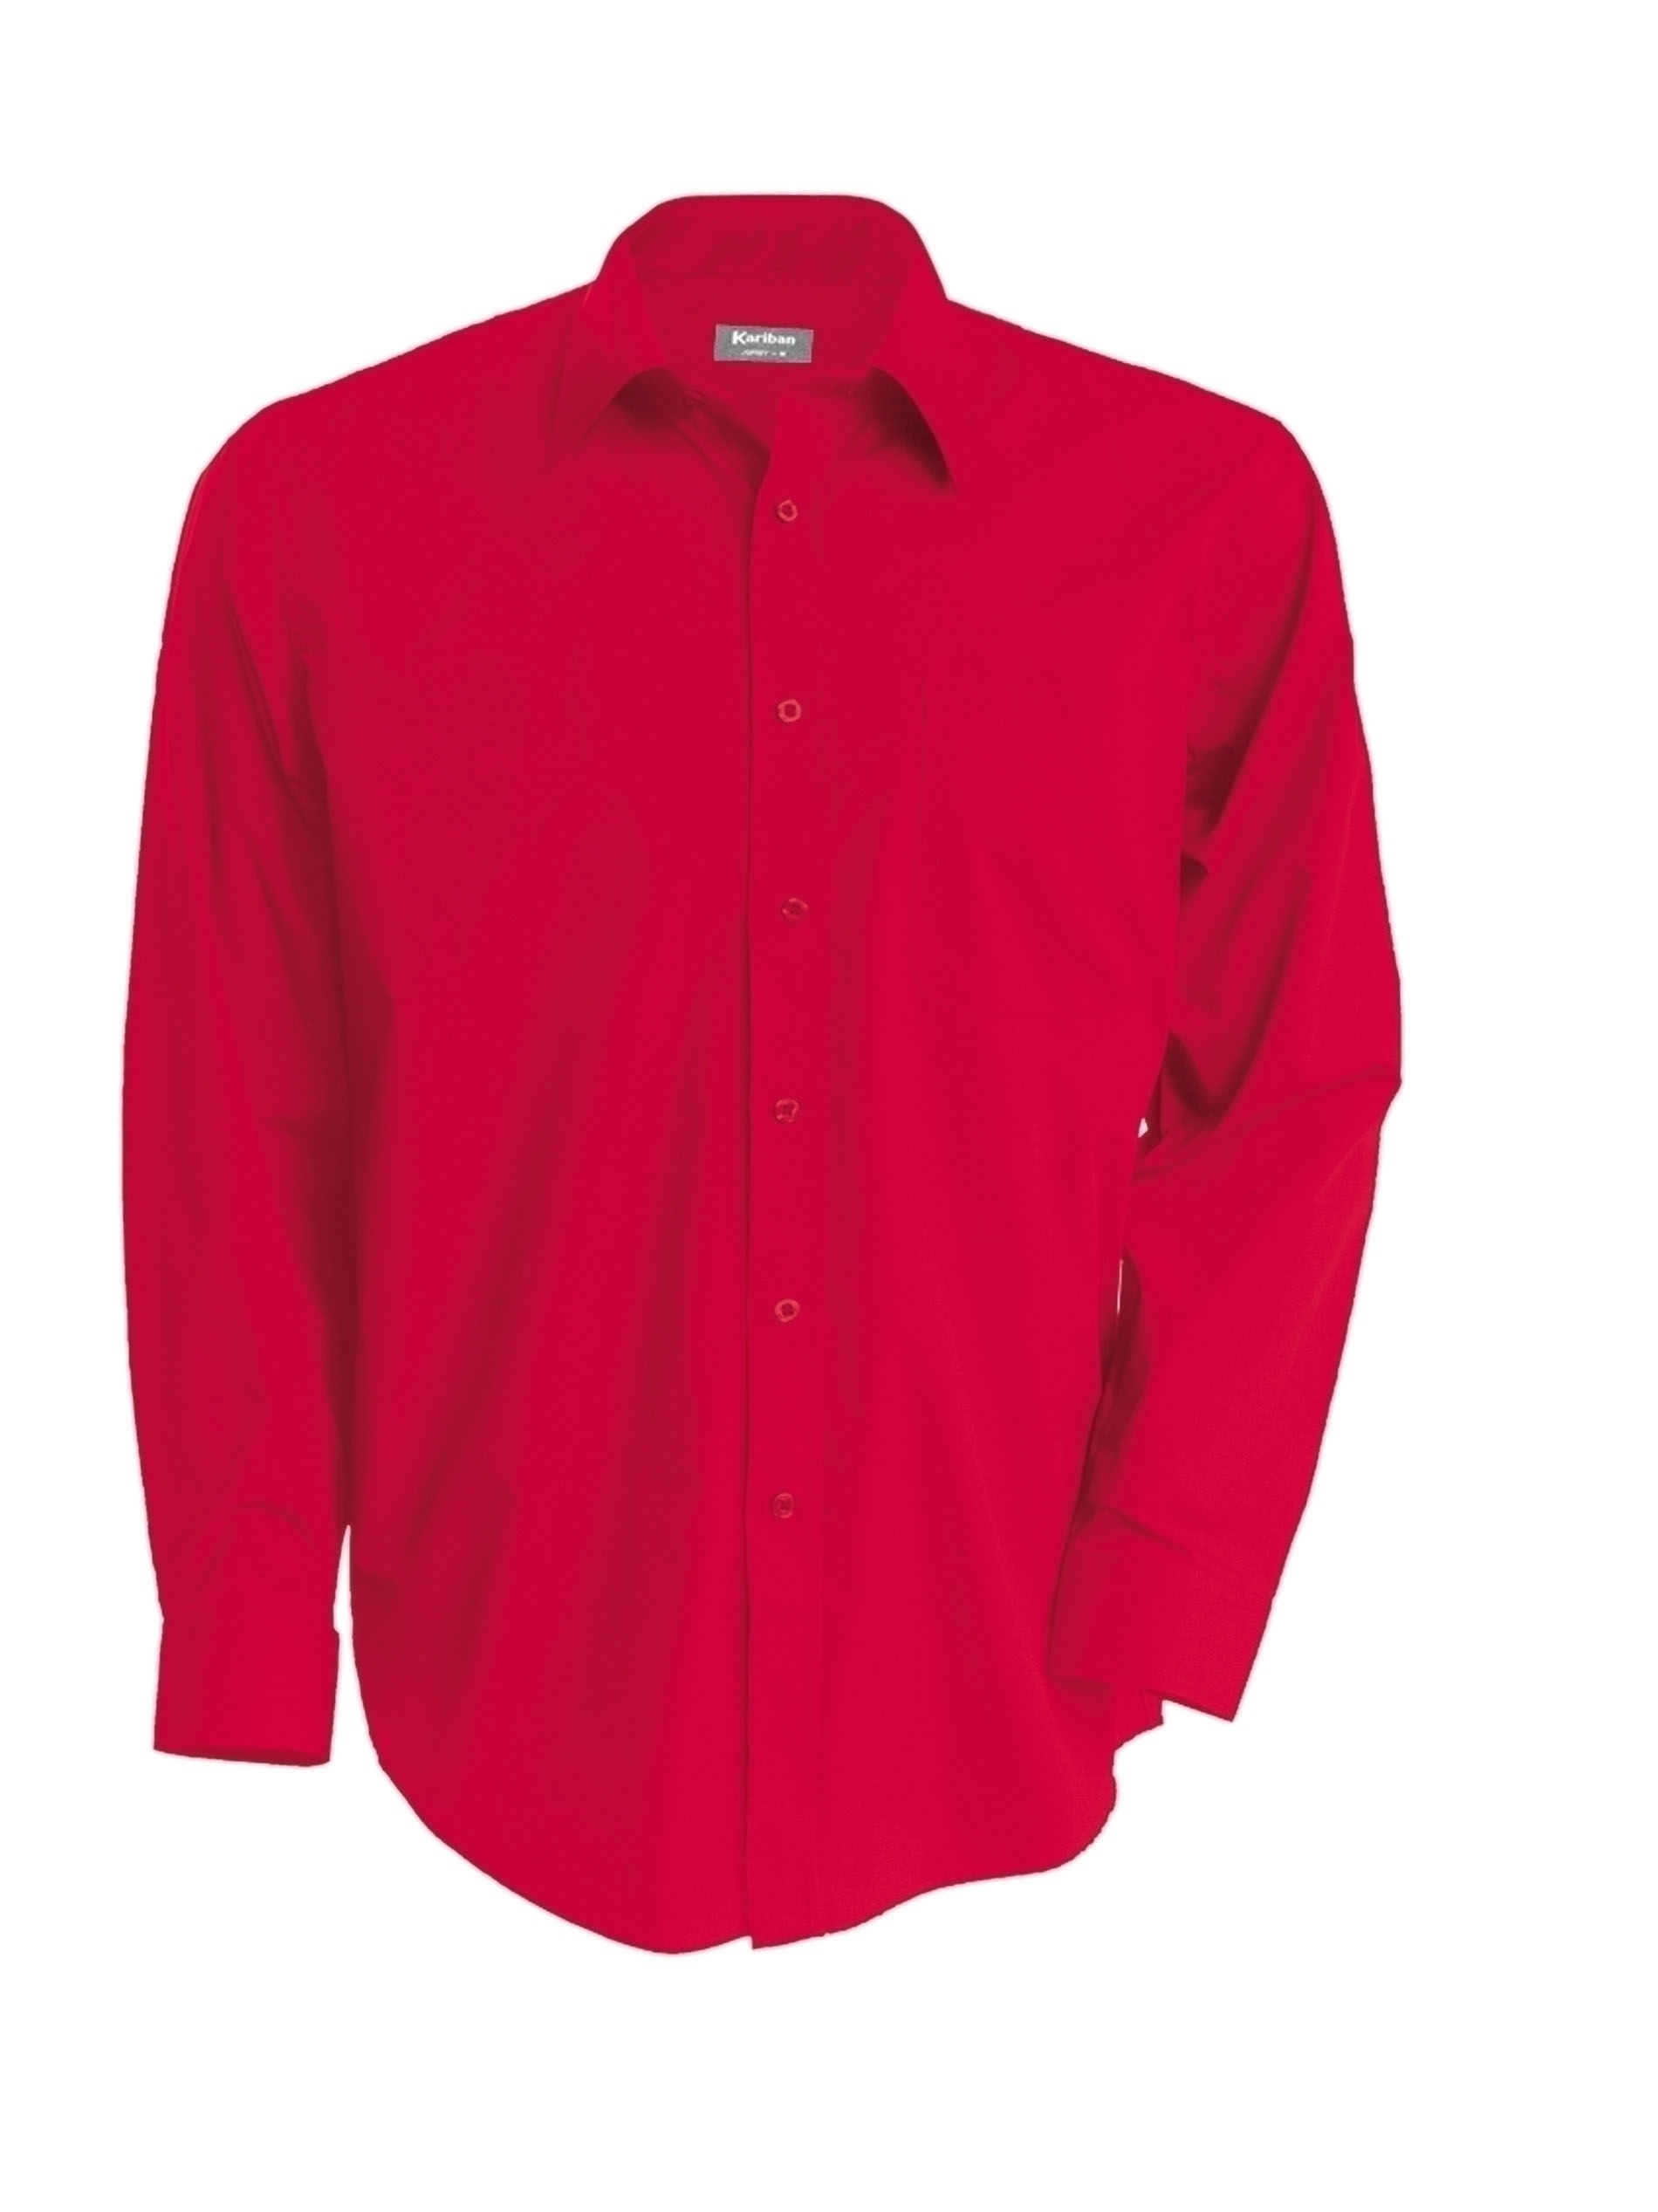 jofrey chemise manches longues classic red gladiasport. Black Bedroom Furniture Sets. Home Design Ideas